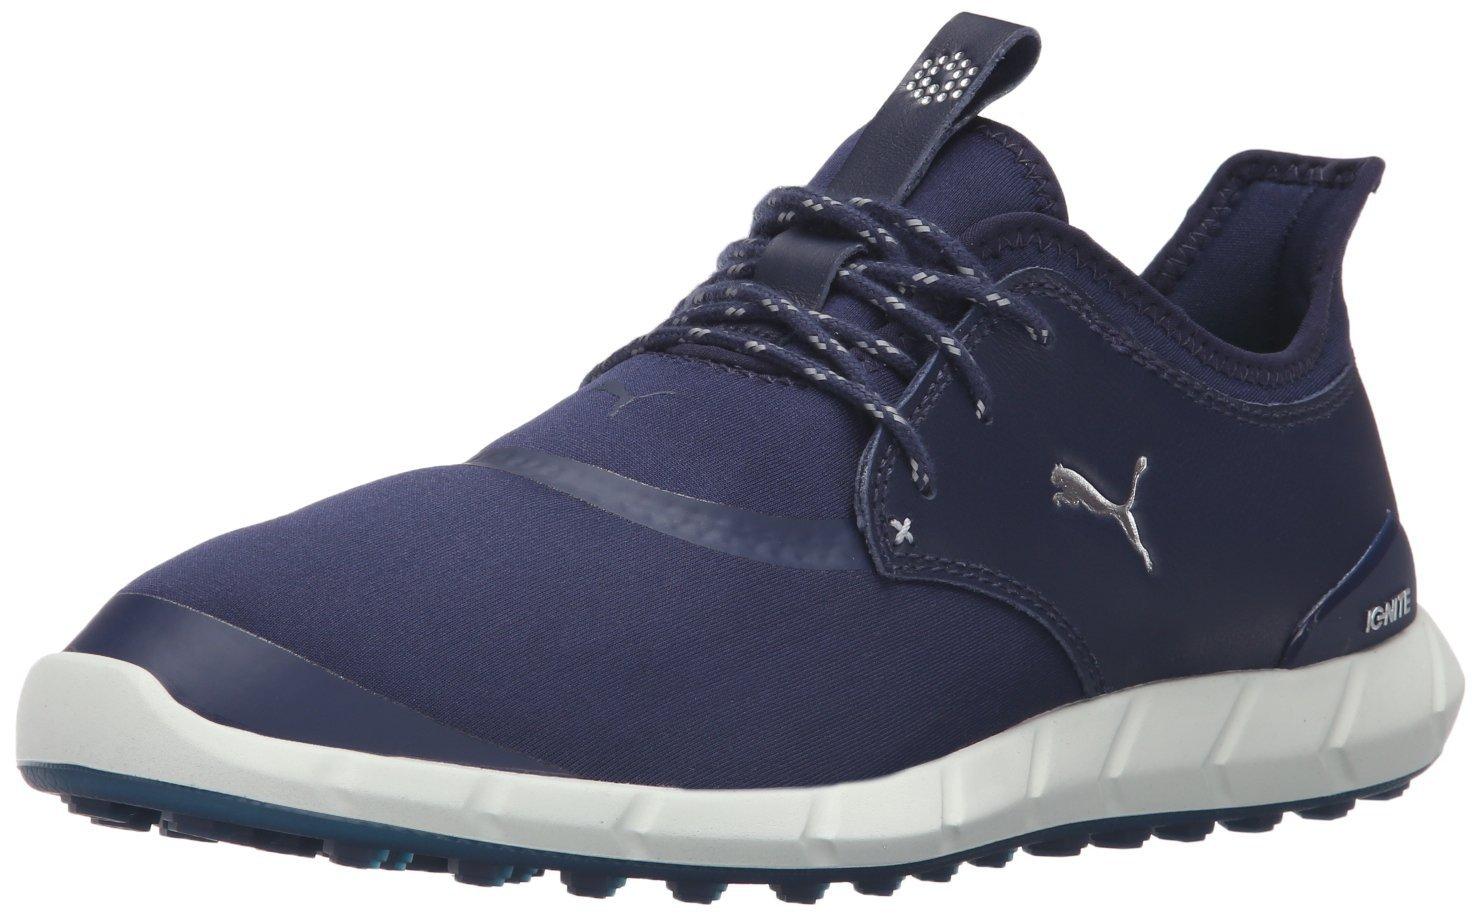 PUMA Men's Ignite Spikeless Sport Golf Shoe, Peacoat Silver White, 10.5 Medium US